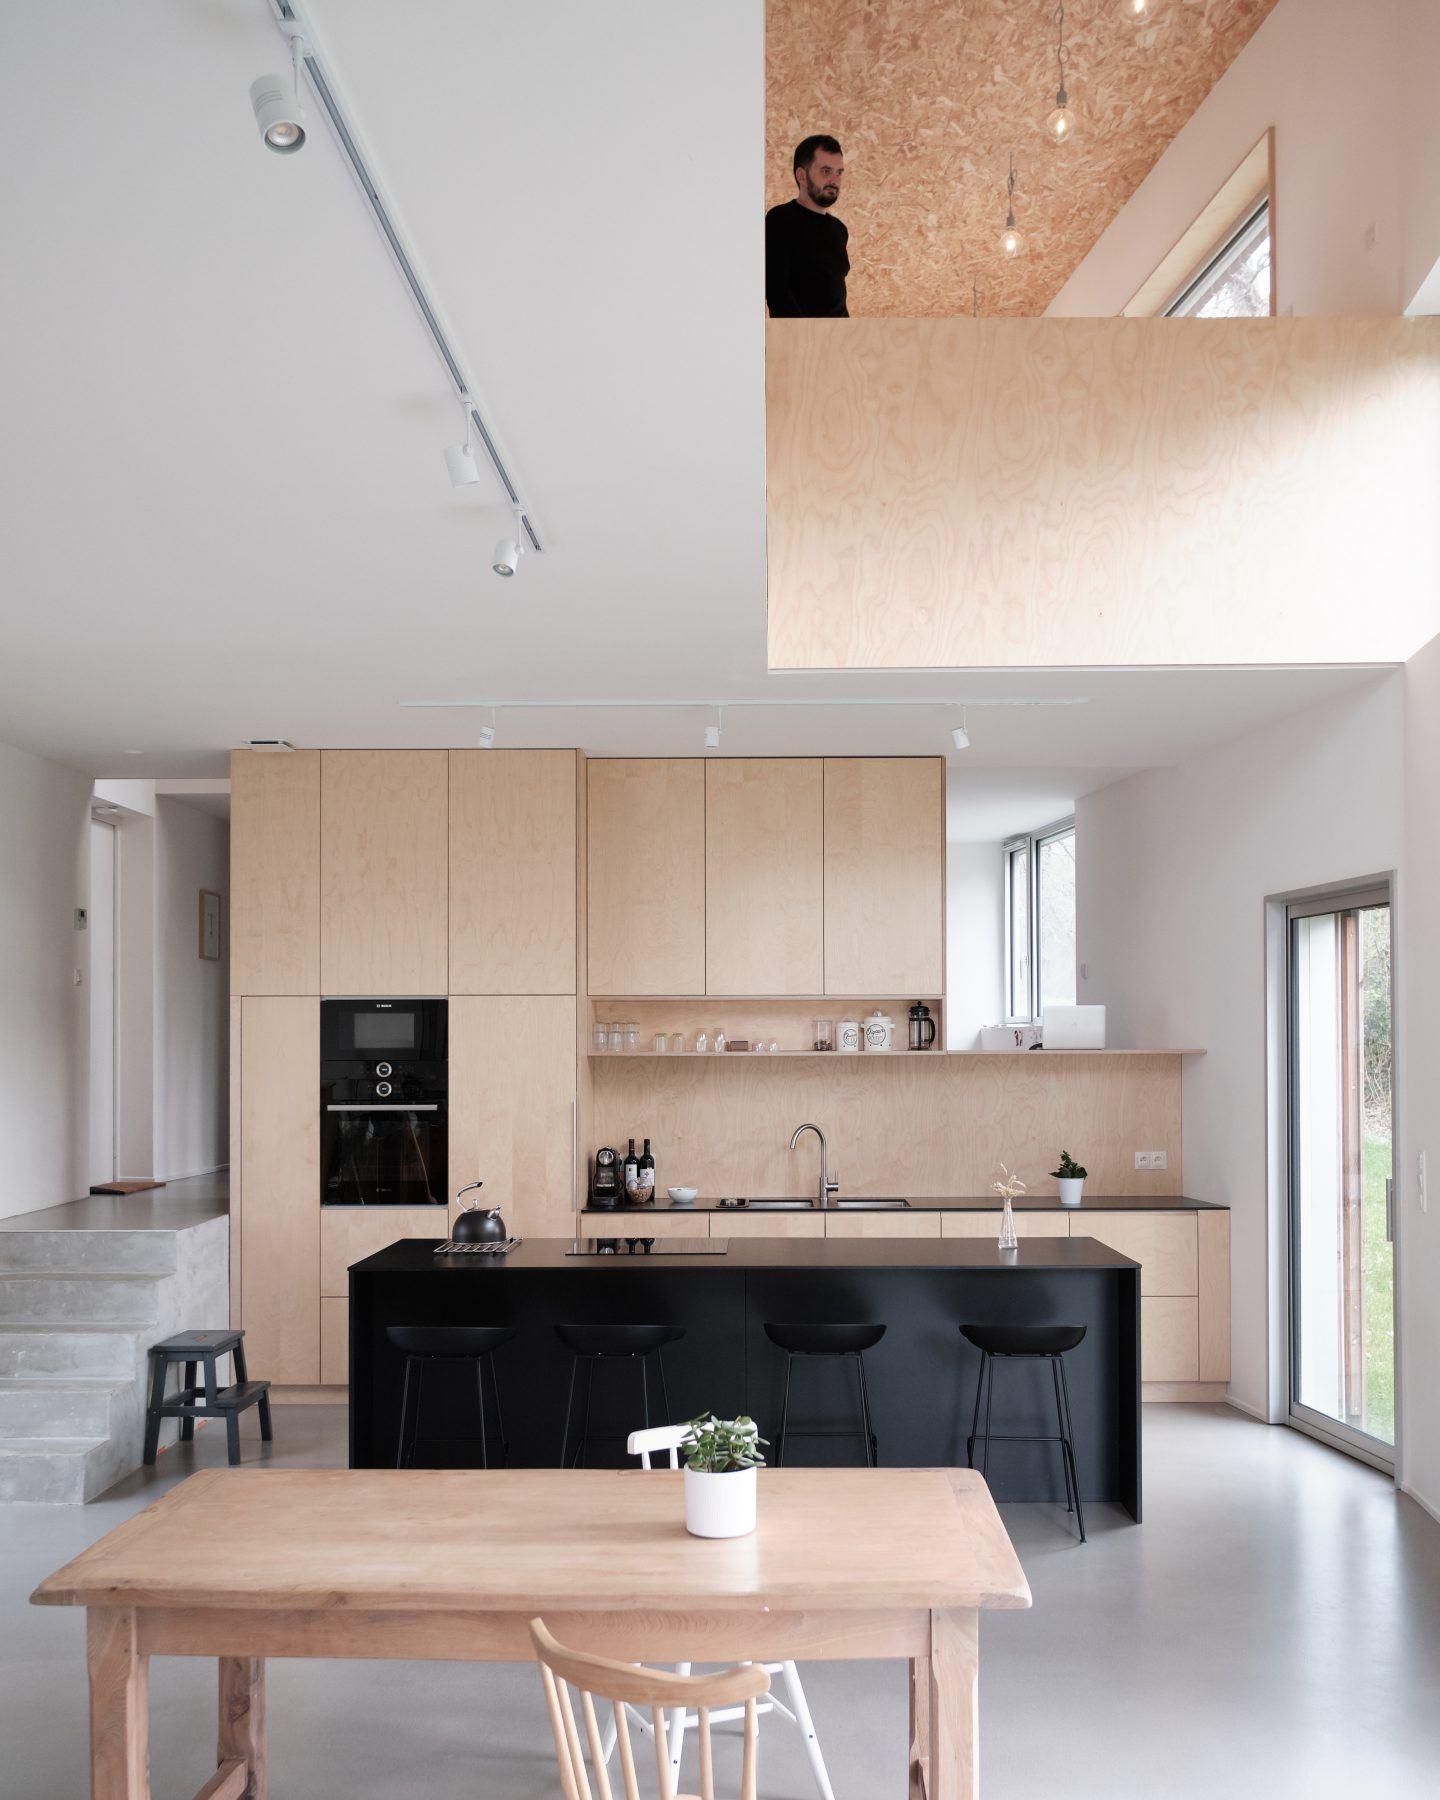 IGNANT-Architecture-Atelier-MIMA-CTBHouse-9